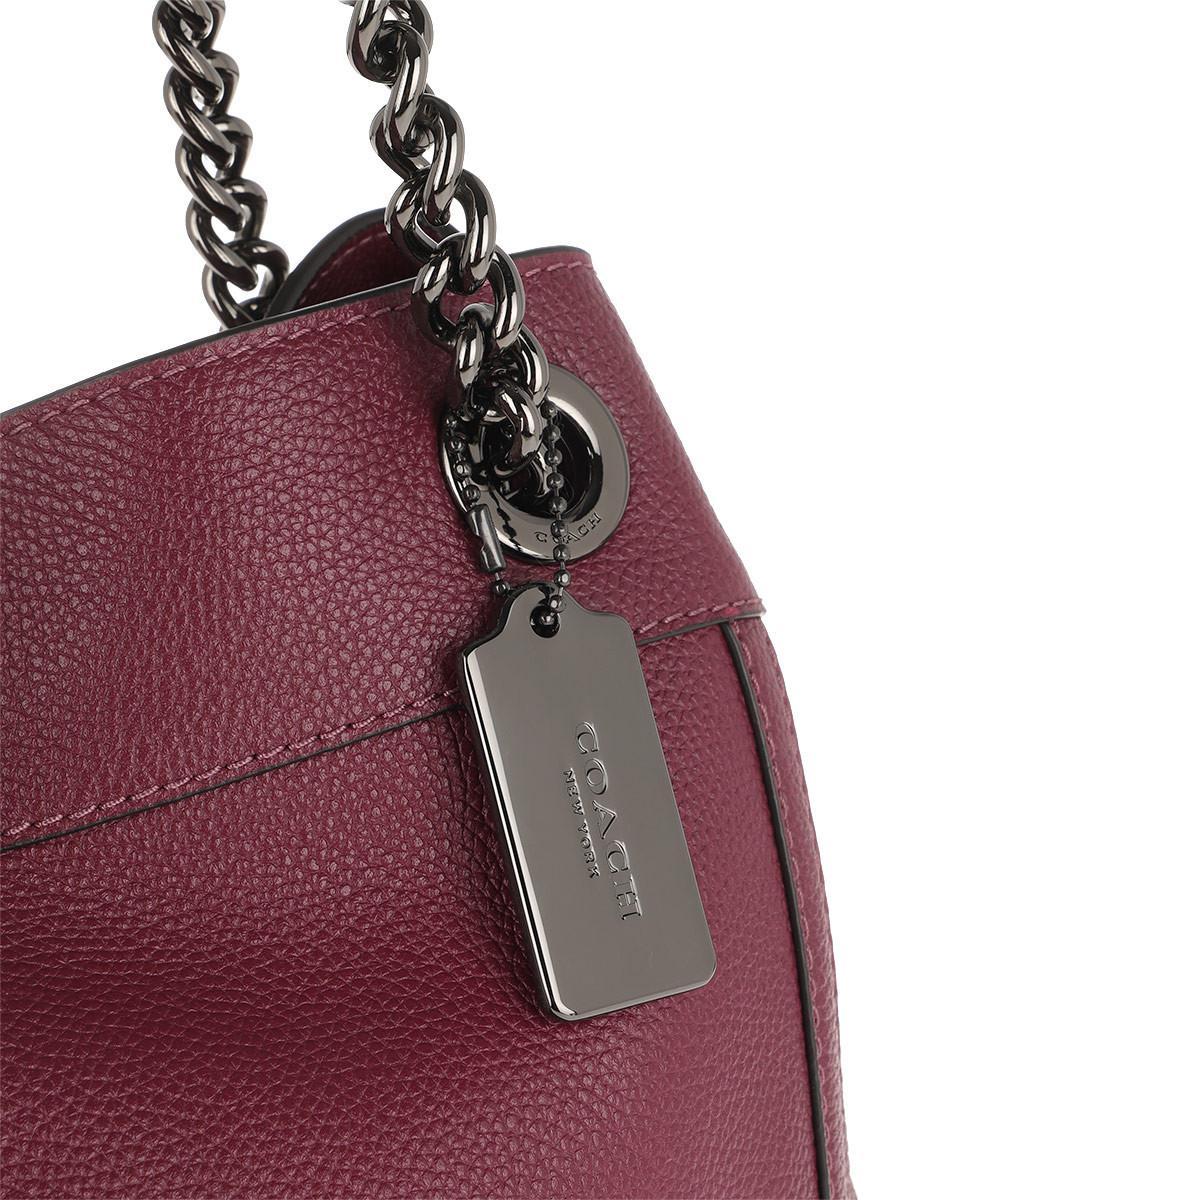 COACH - Red Polished Leather Turnlock Edie Shoulder Bag Dark Berry - Lyst.  View fullscreen 4305fc58923ec